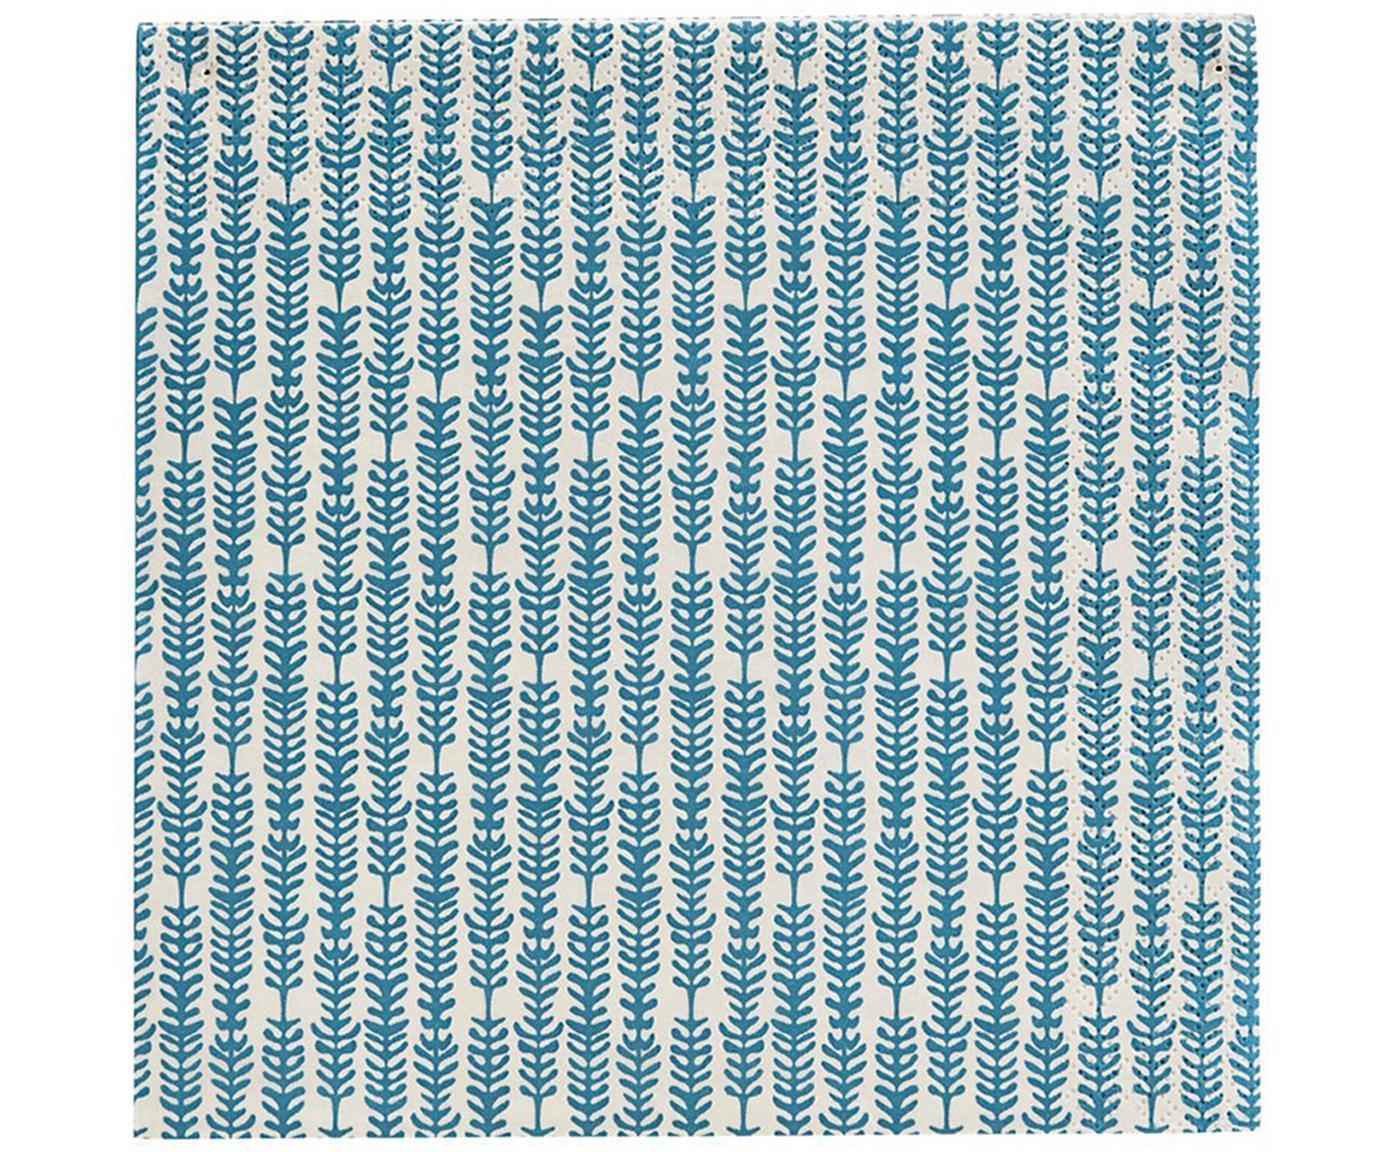 Papierservietten Branch, 20 stuks, Papier, Blauw, wit, 33 x 33 cm